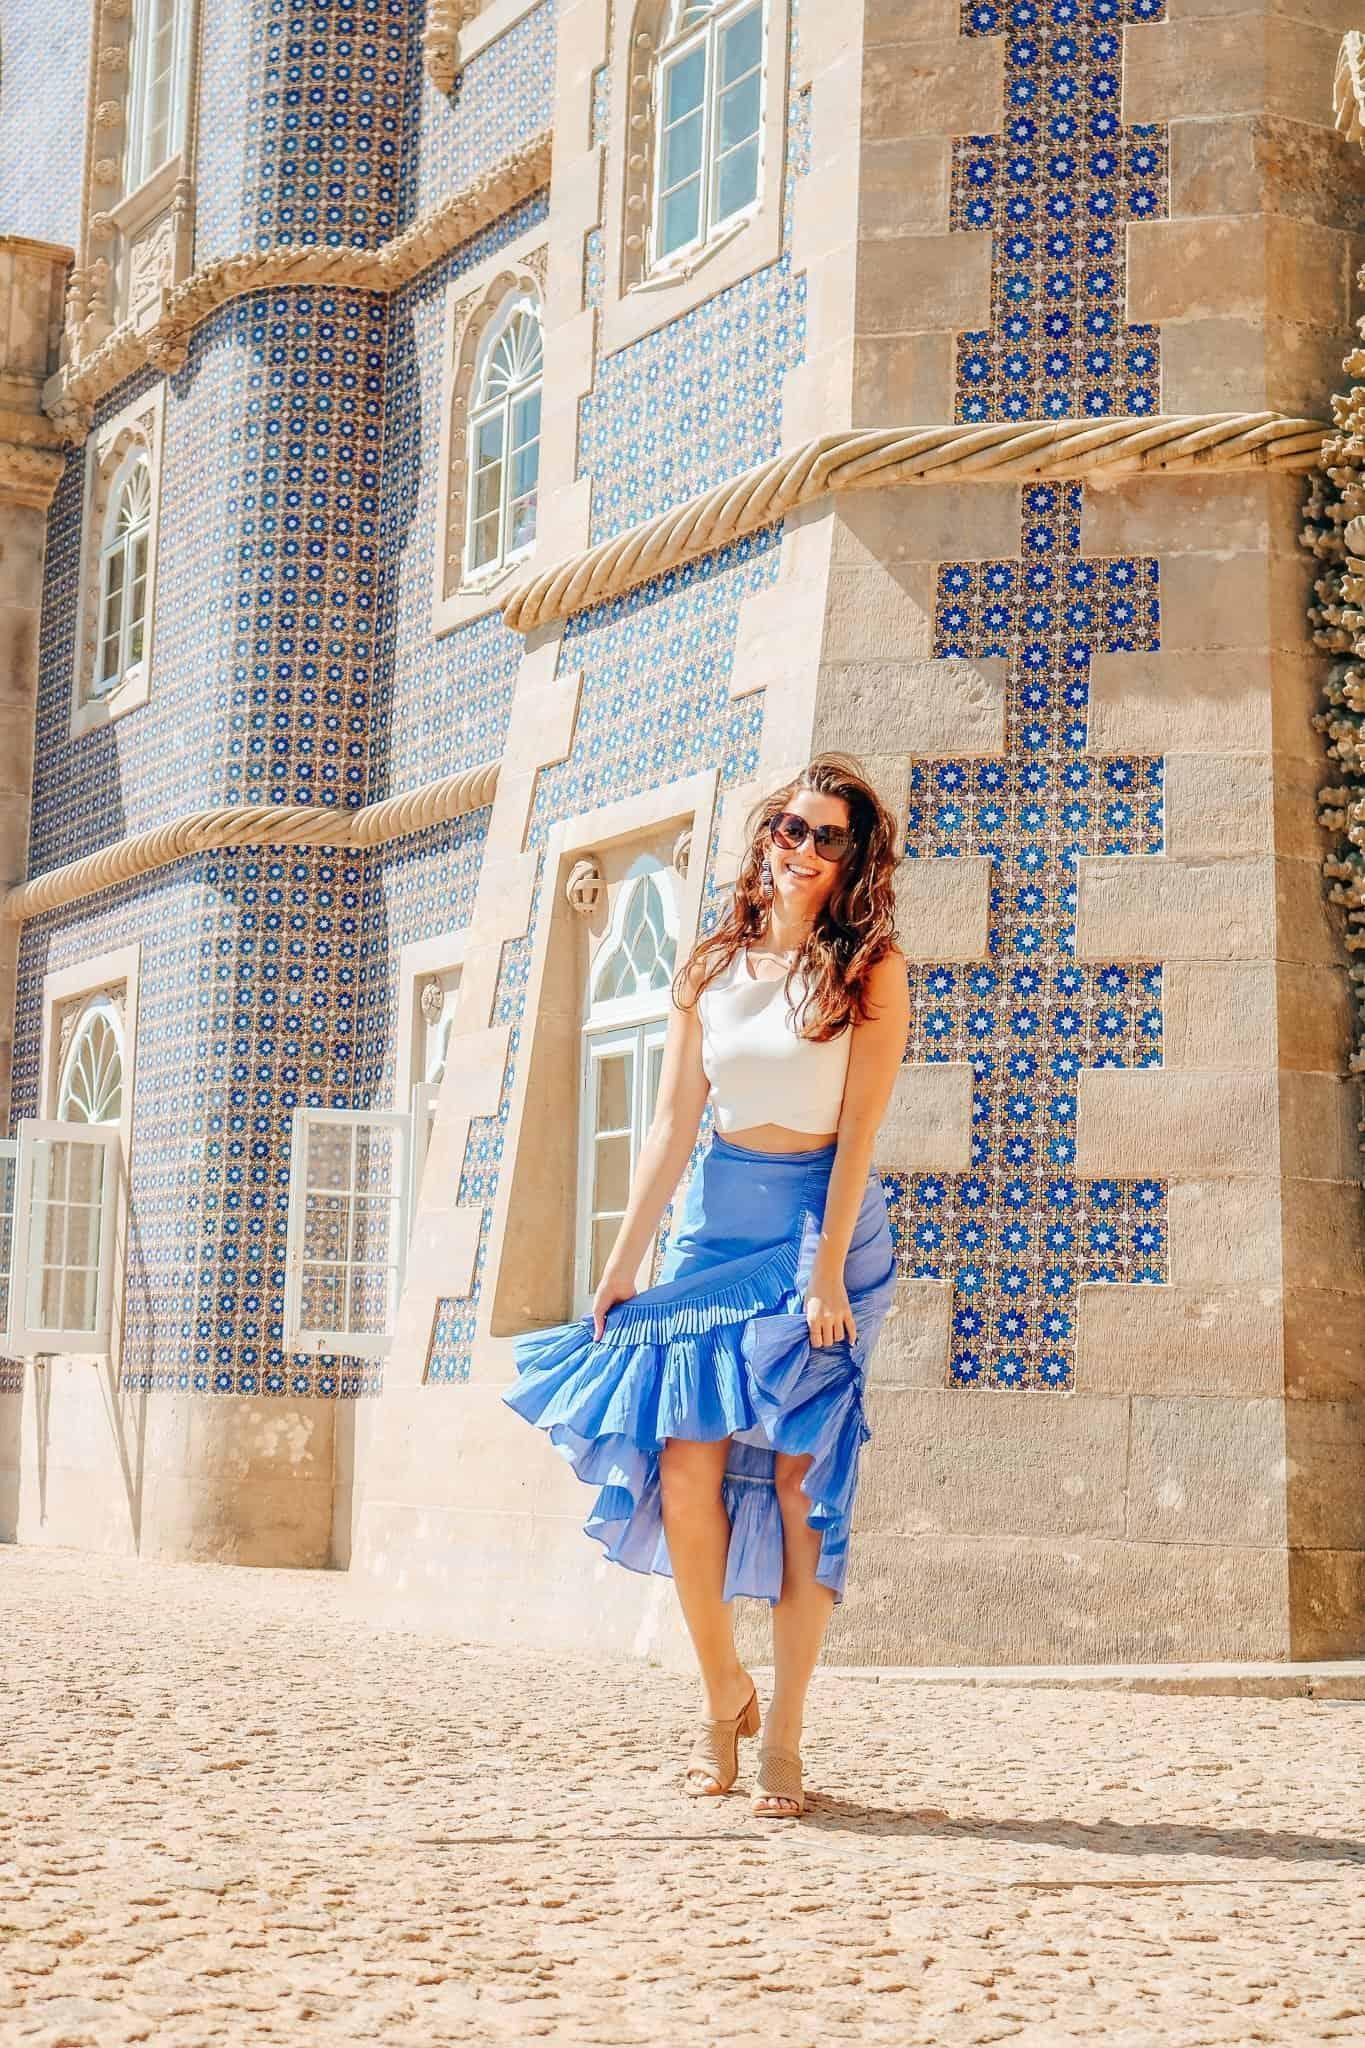 A Sintra Day Trip Pena Palace